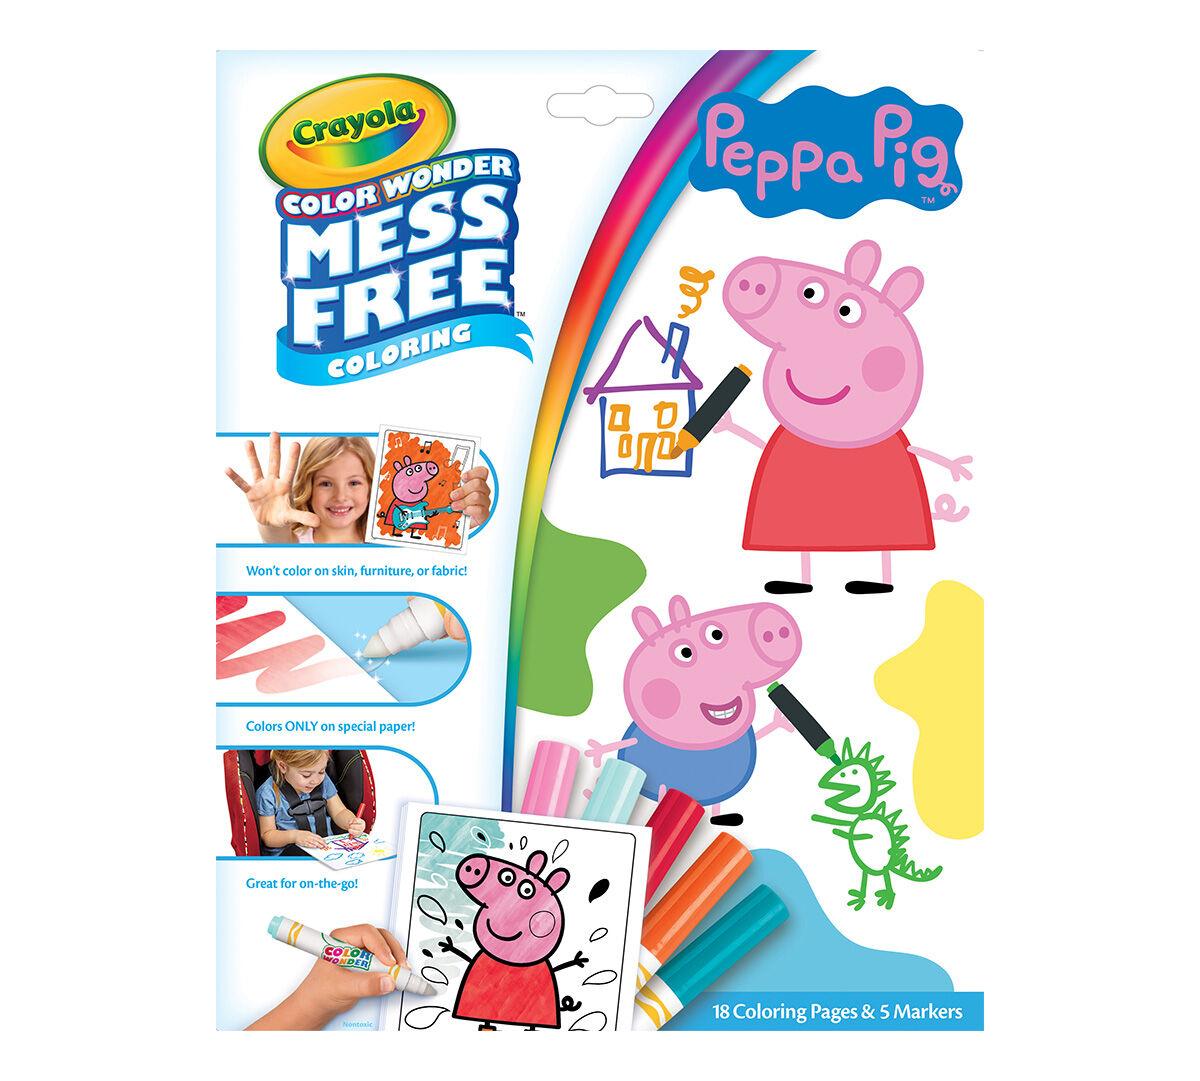 Color Wonder Mess Free Peppa Pig Coloring Set | Crayola.com | Crayola